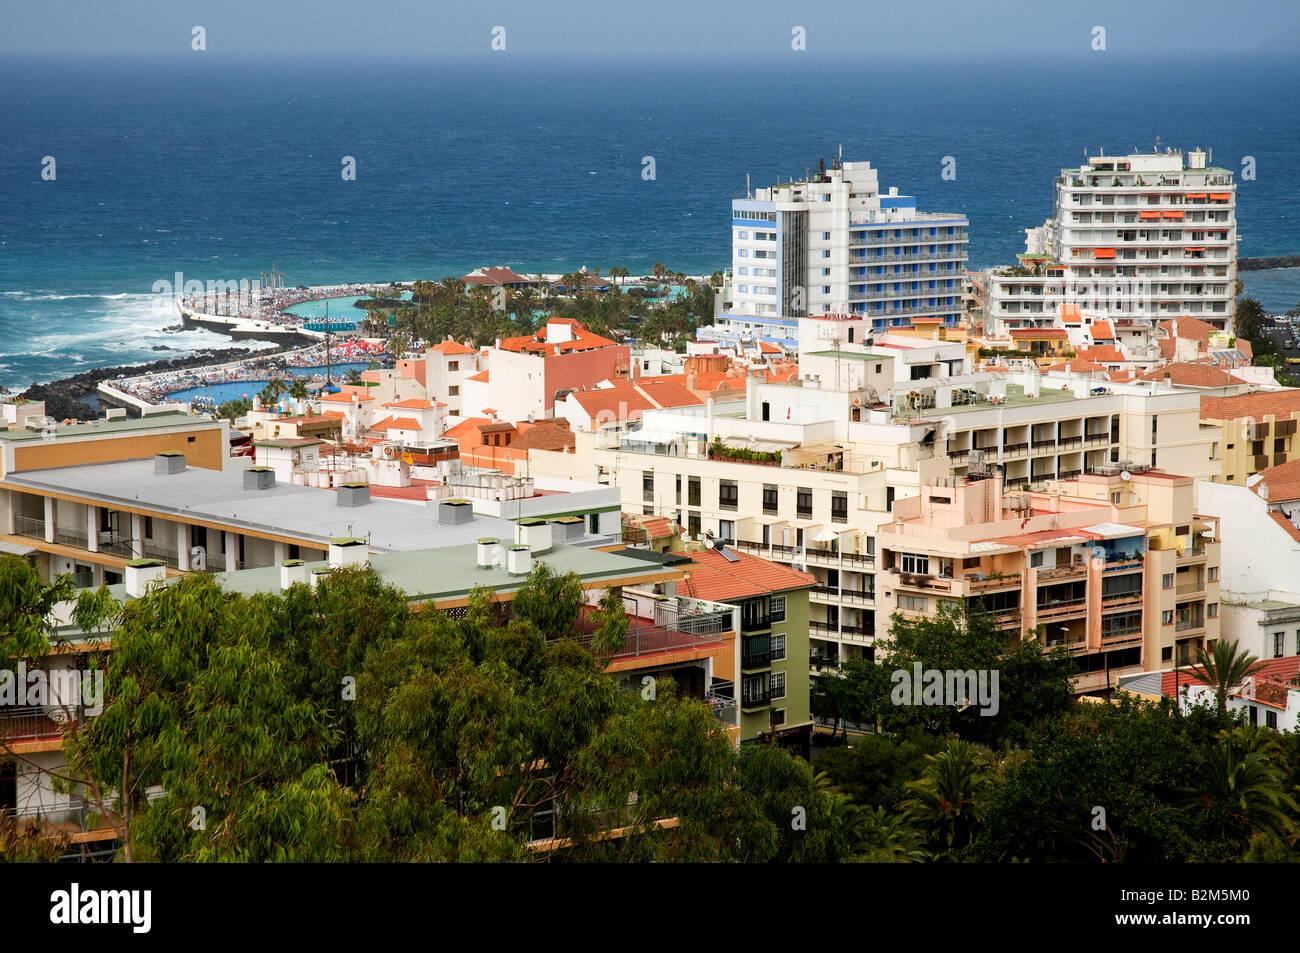 View of Puerto de la Cruz, Tenerife, Canary Islands, Spain - Stock Image